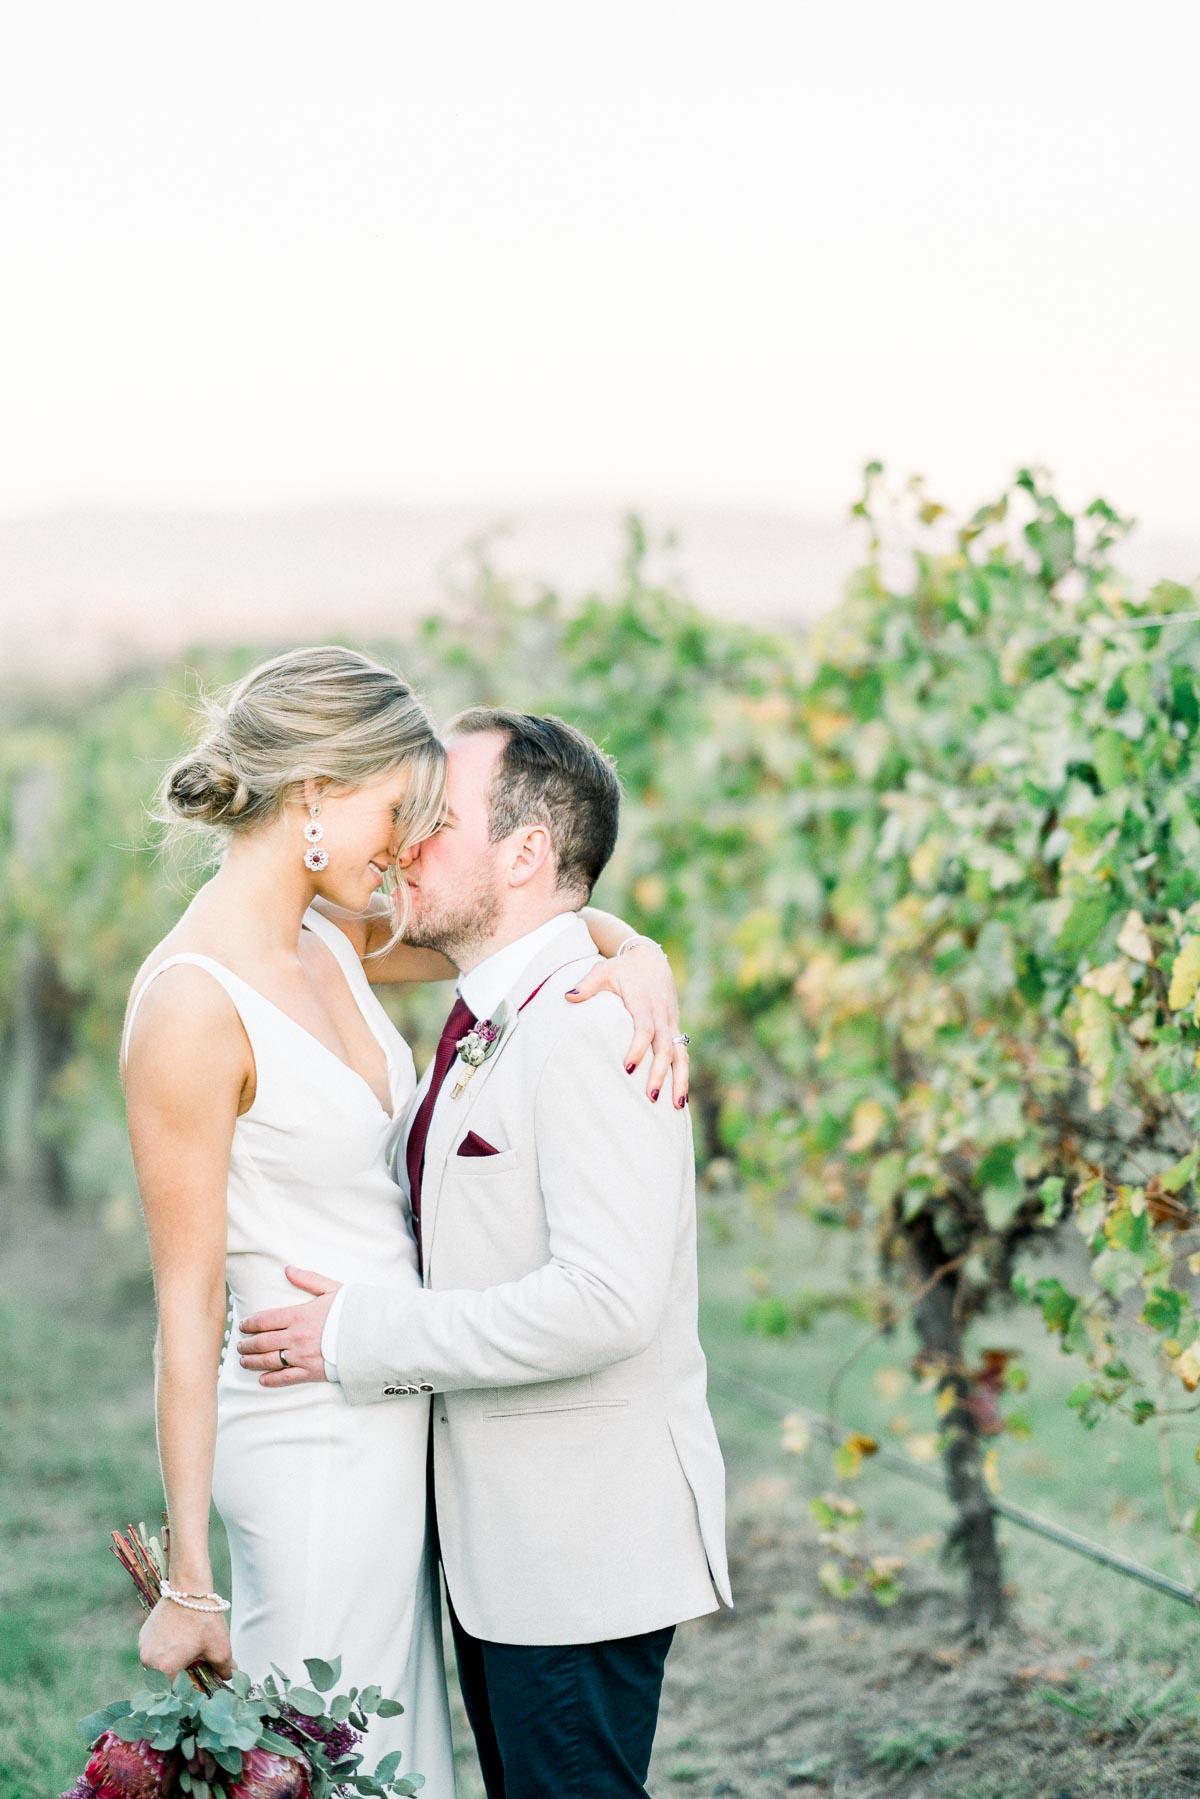 rustic-yarra-valley-wedding-venue-acacia-ridge-georgia-james-08320.jpg